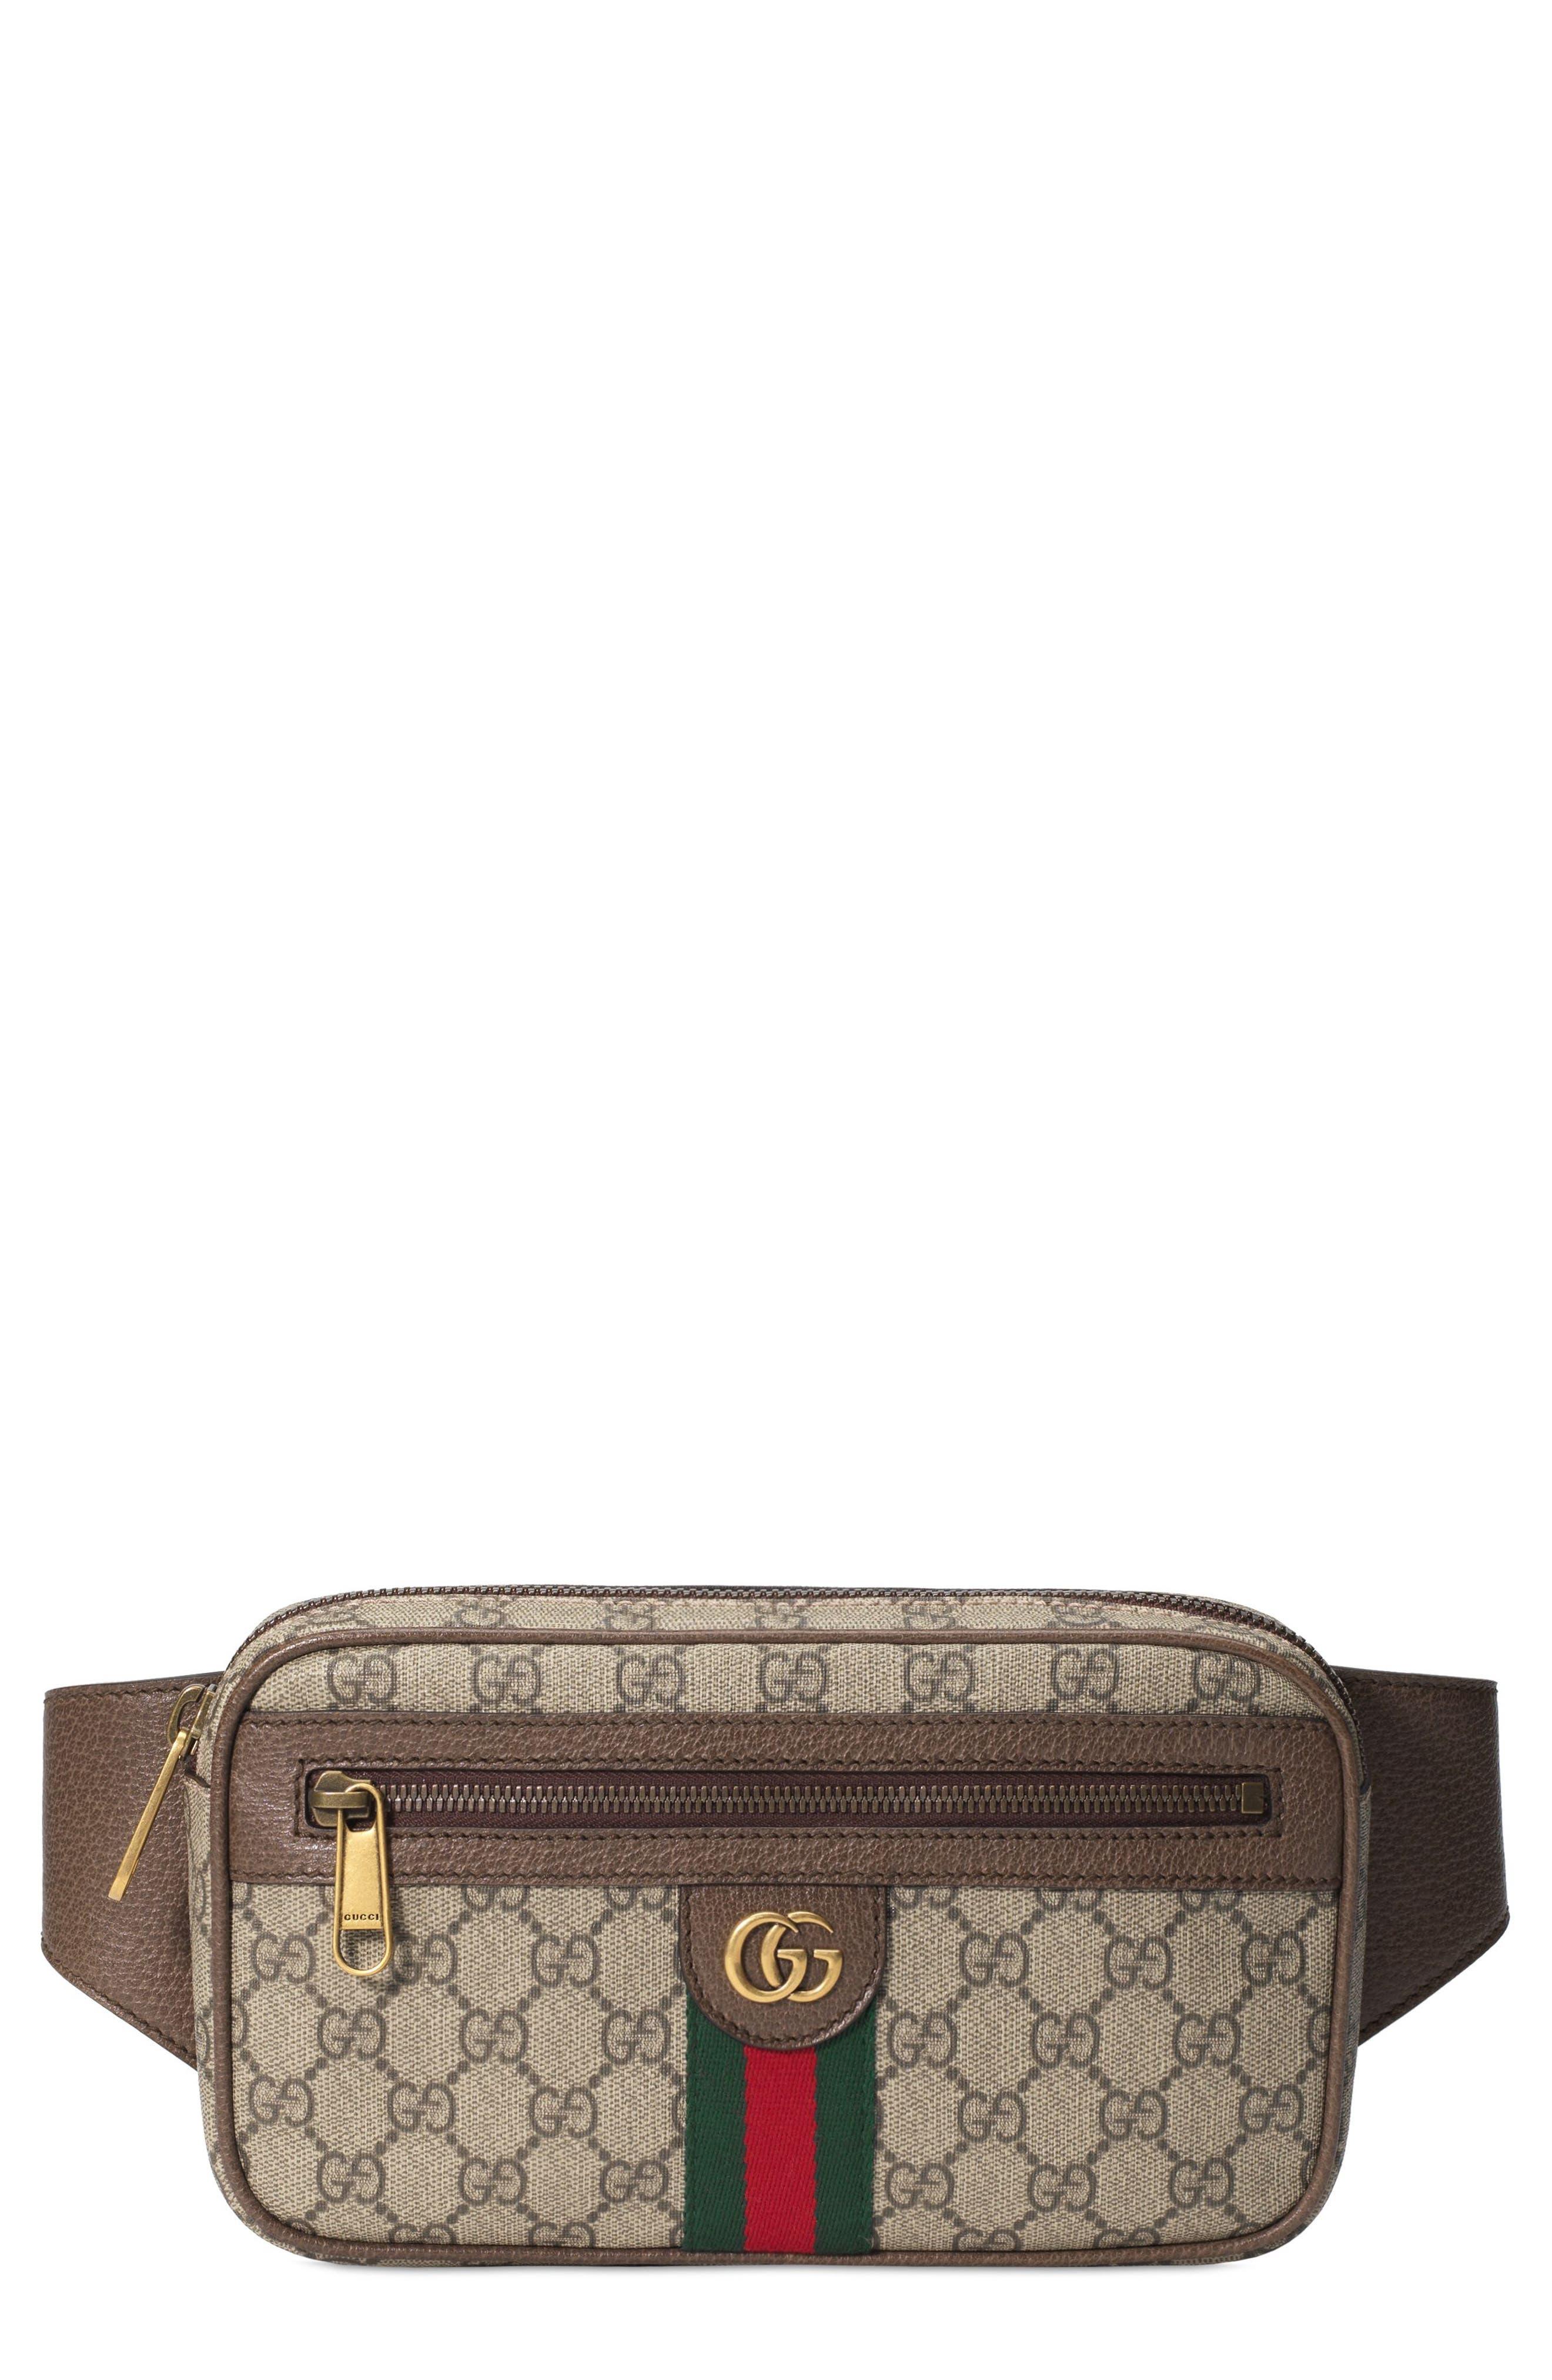 ff638f5177 $1100 Men's Gucci Ophidia Gg Supreme Canvas Belt Bag -